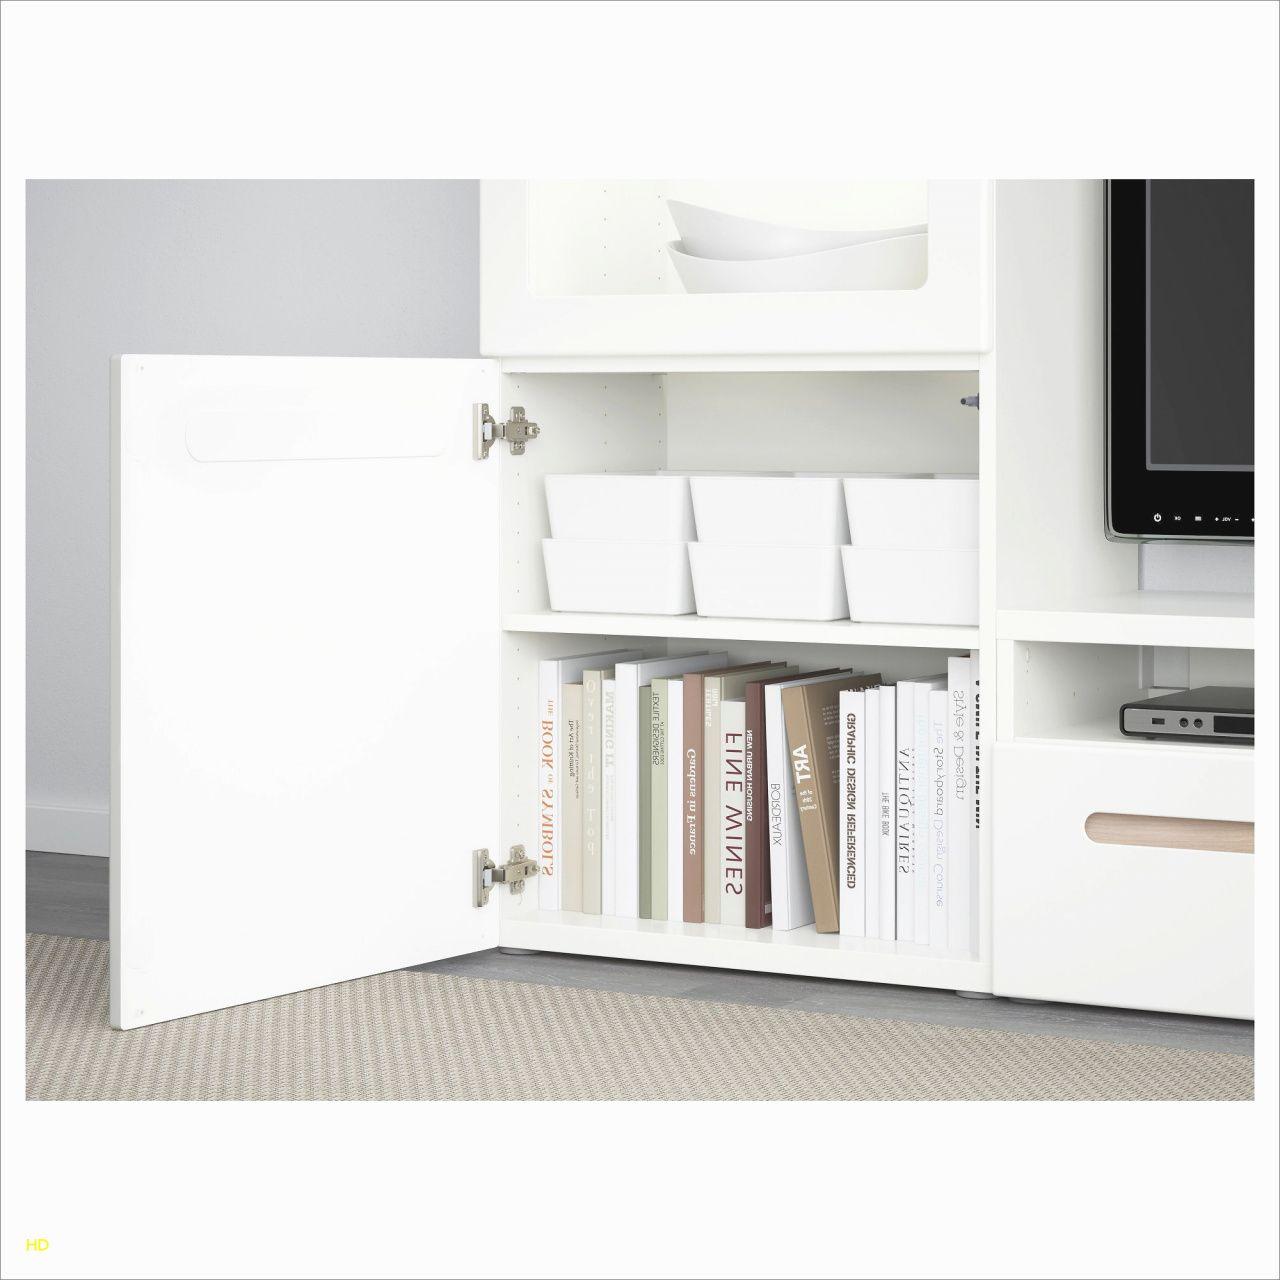 55 Ikea Banc De Rangement Cuisine Design In 2019